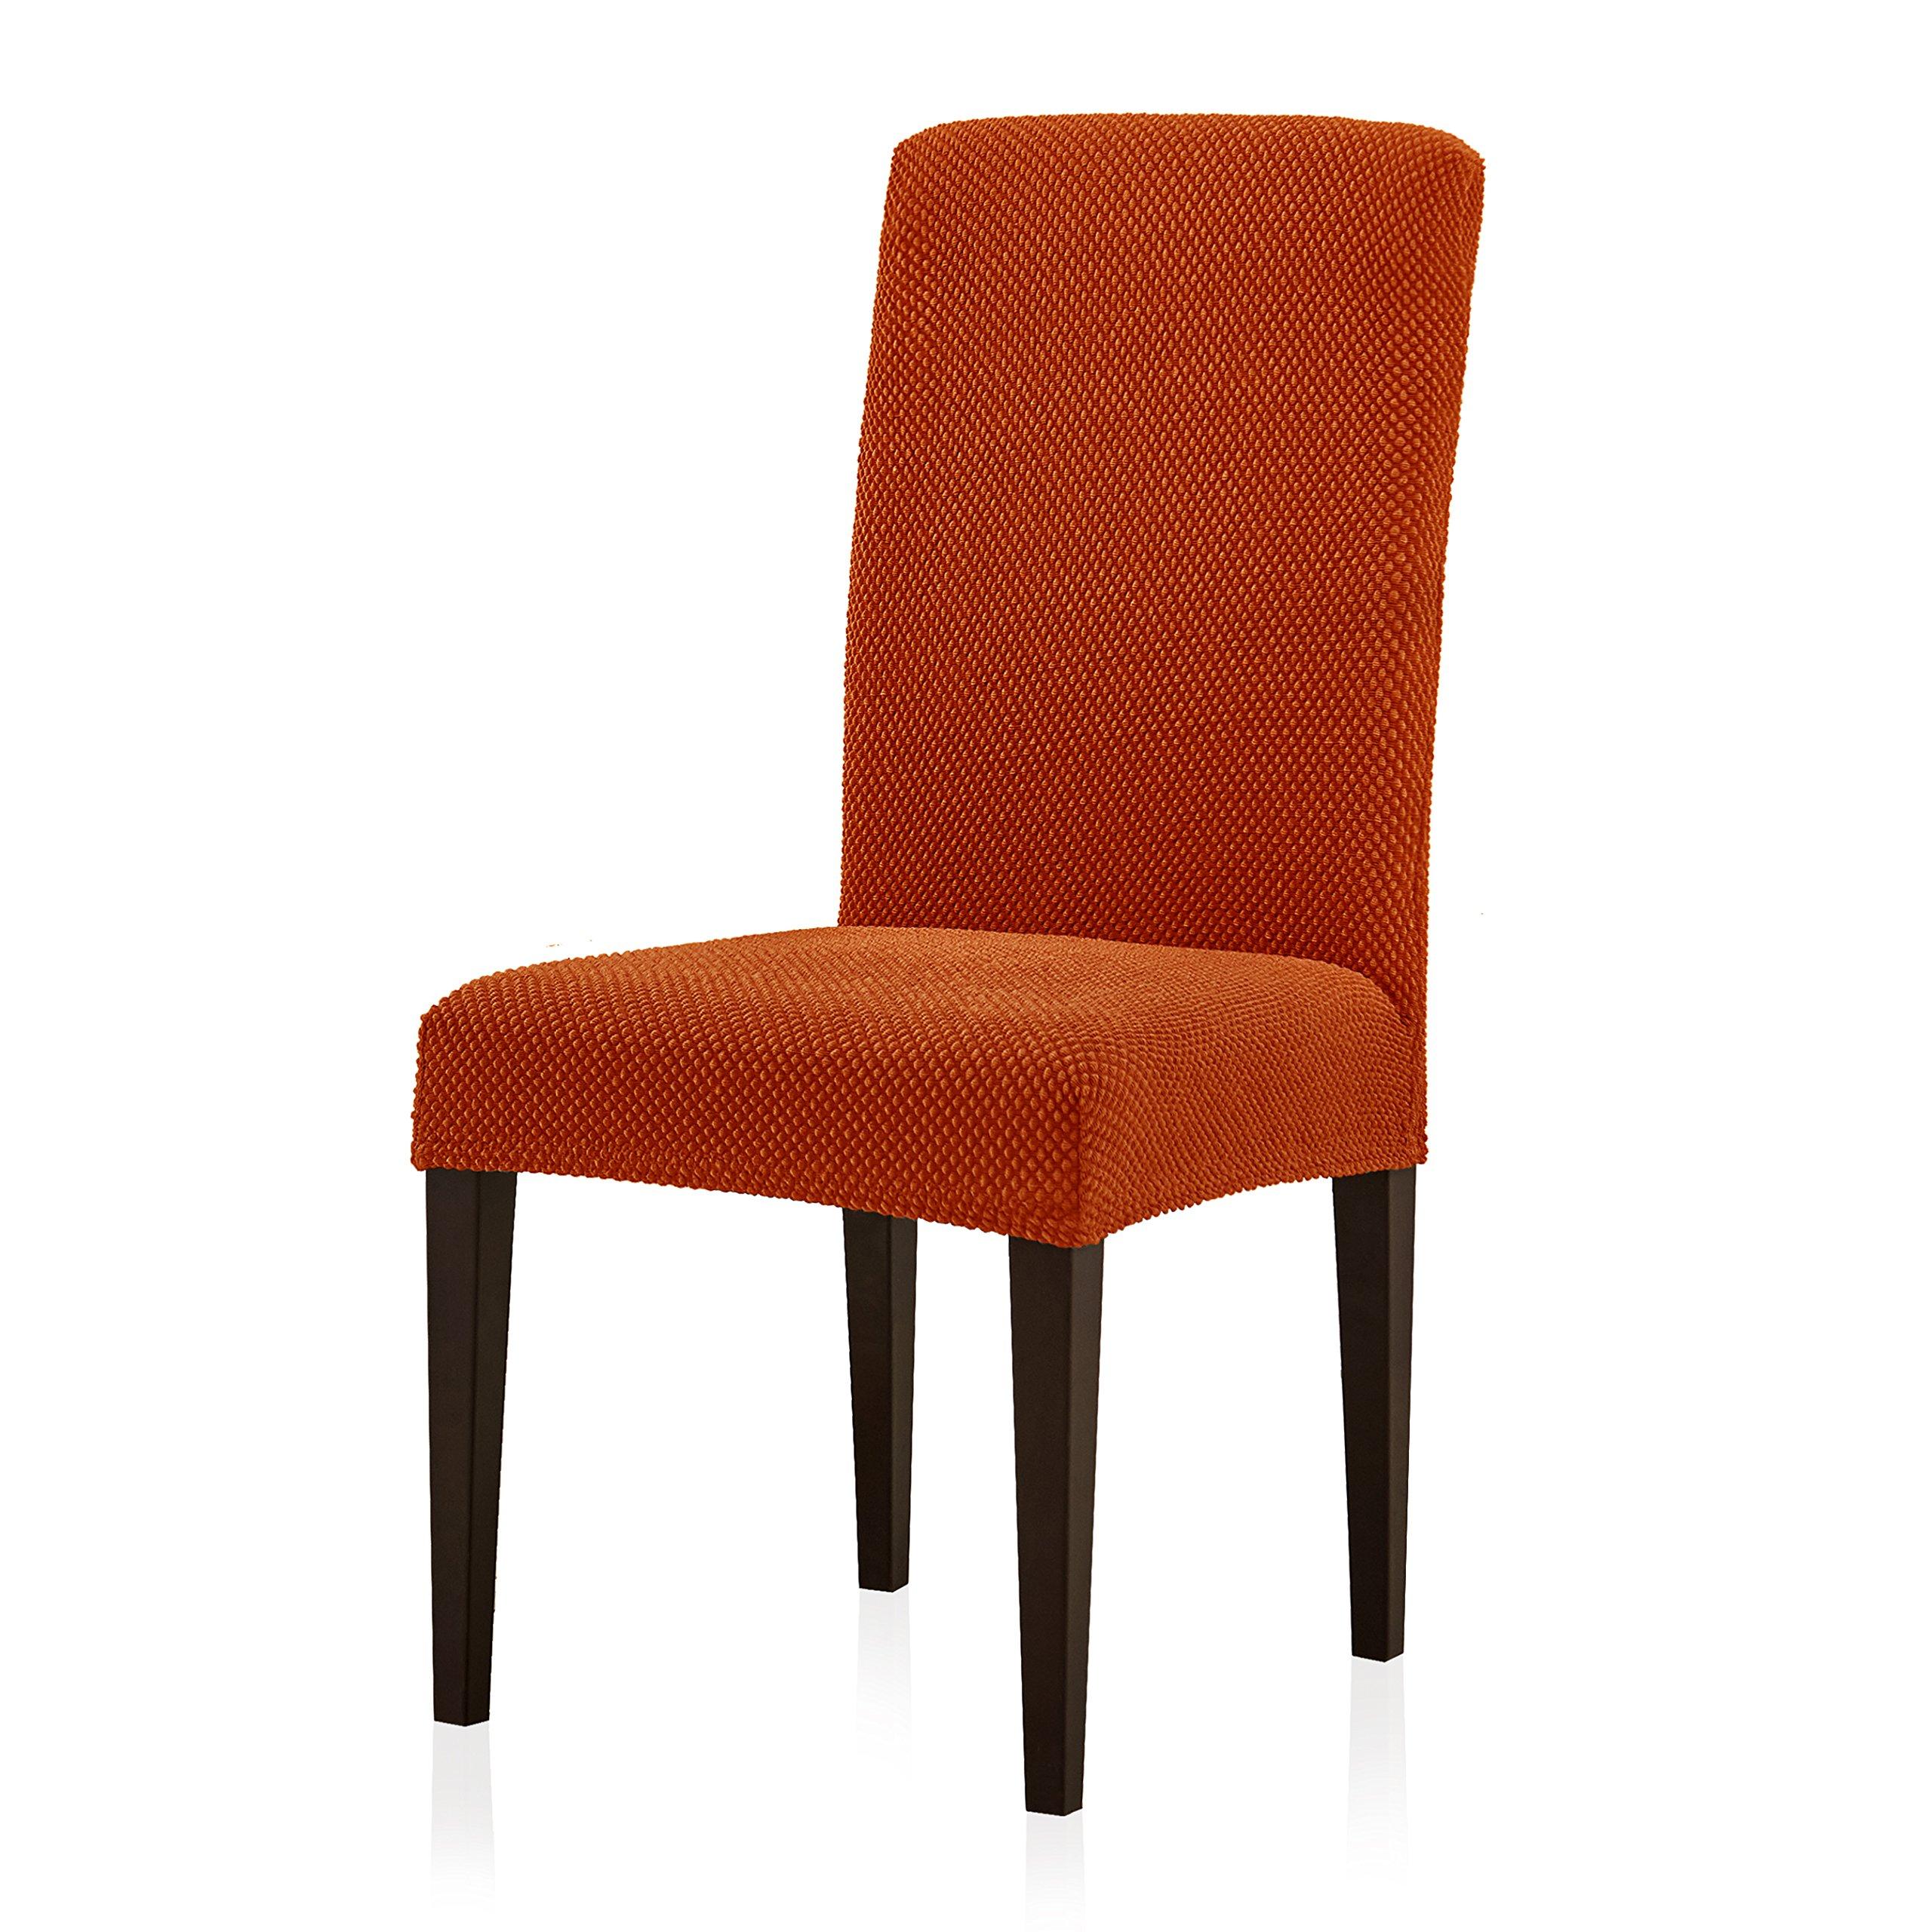 Subrtex Stretch Dining Room Chair Slipcovers (4, Orange Jacquard)